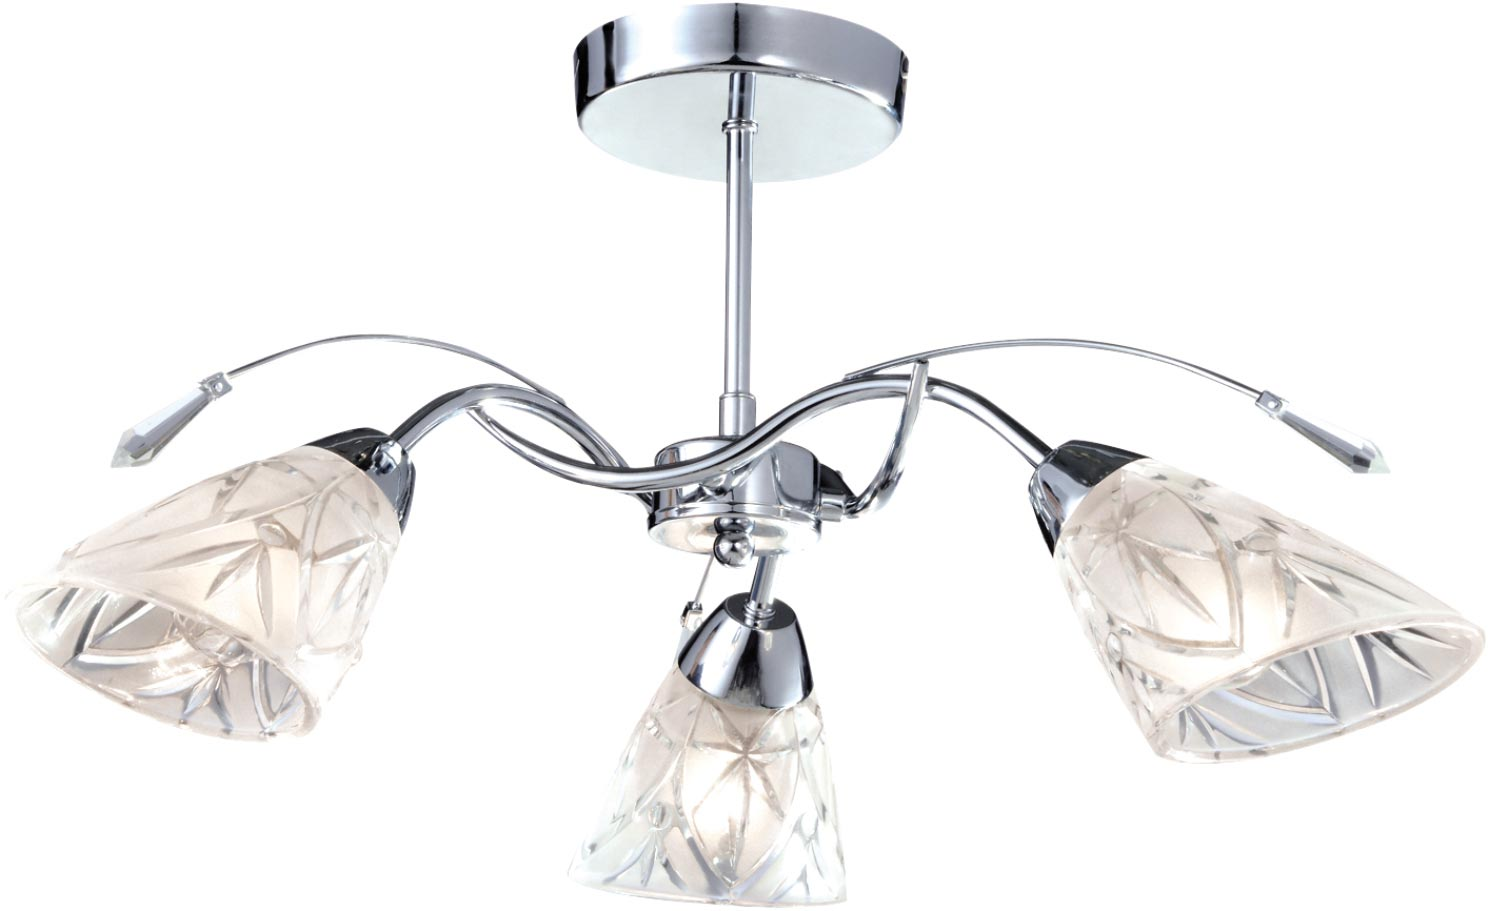 Lampa sufitowa K-JSL-72018/3C CHR z serii TAURUS